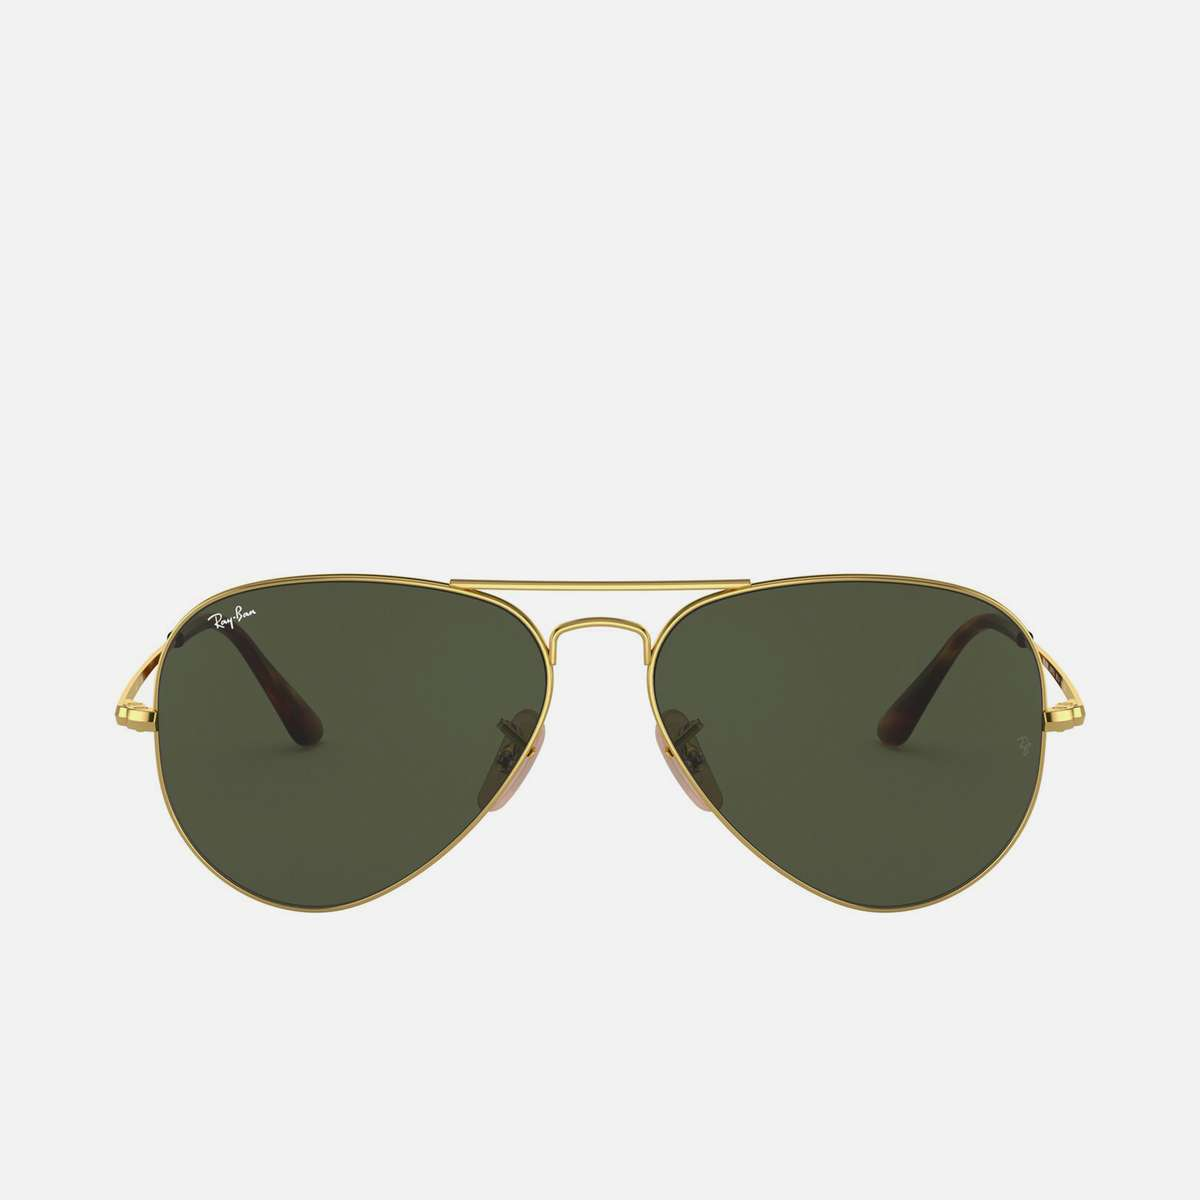 2.RAY-BAN Men UV-Protected Aviator Sunglasses- RB3689914731-55